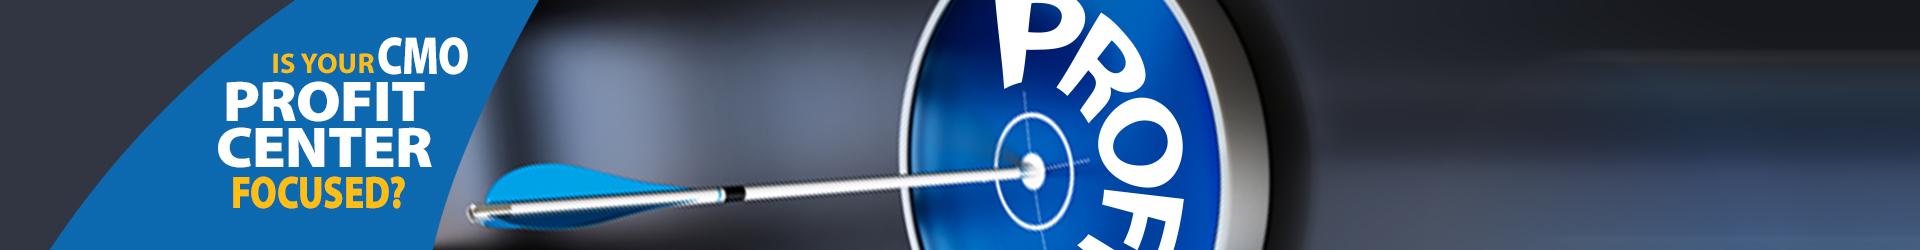 Is your CMO profit center focused?